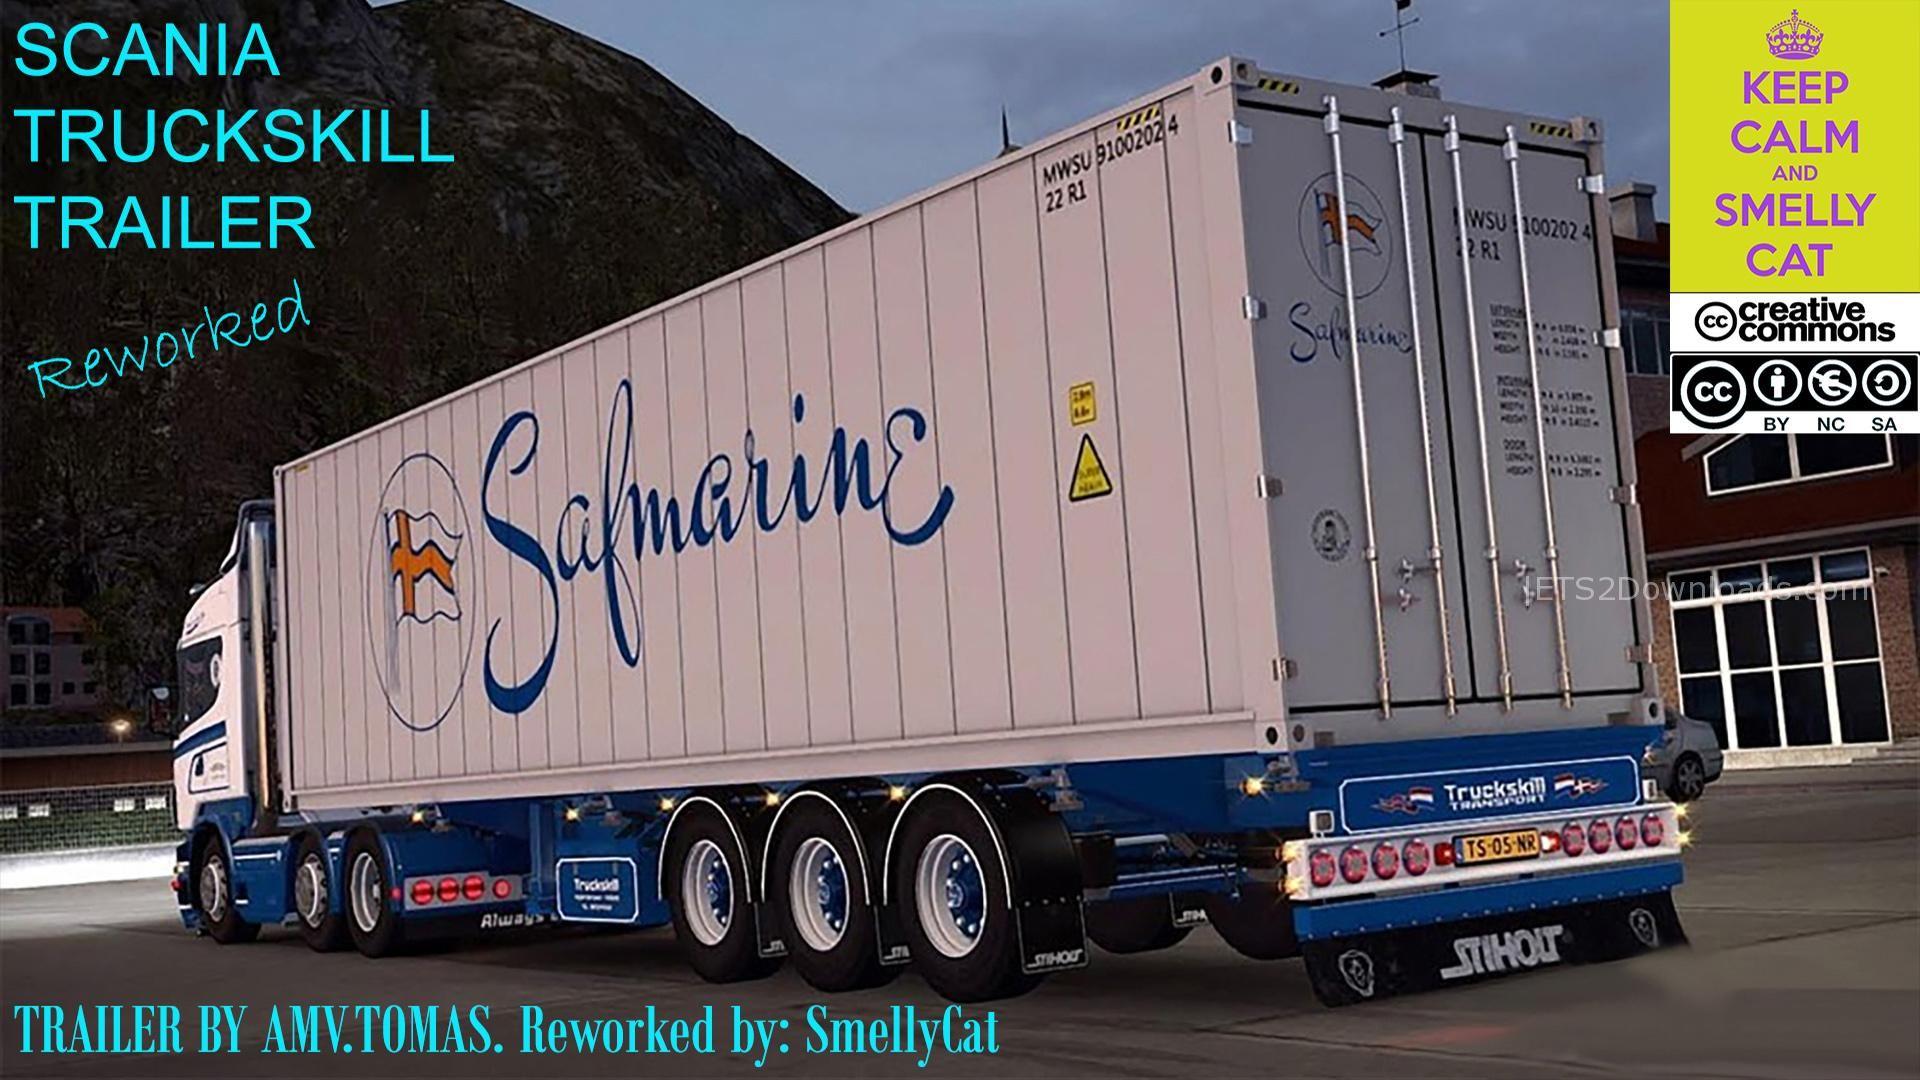 scania-truckskill-trailer-reworked-1